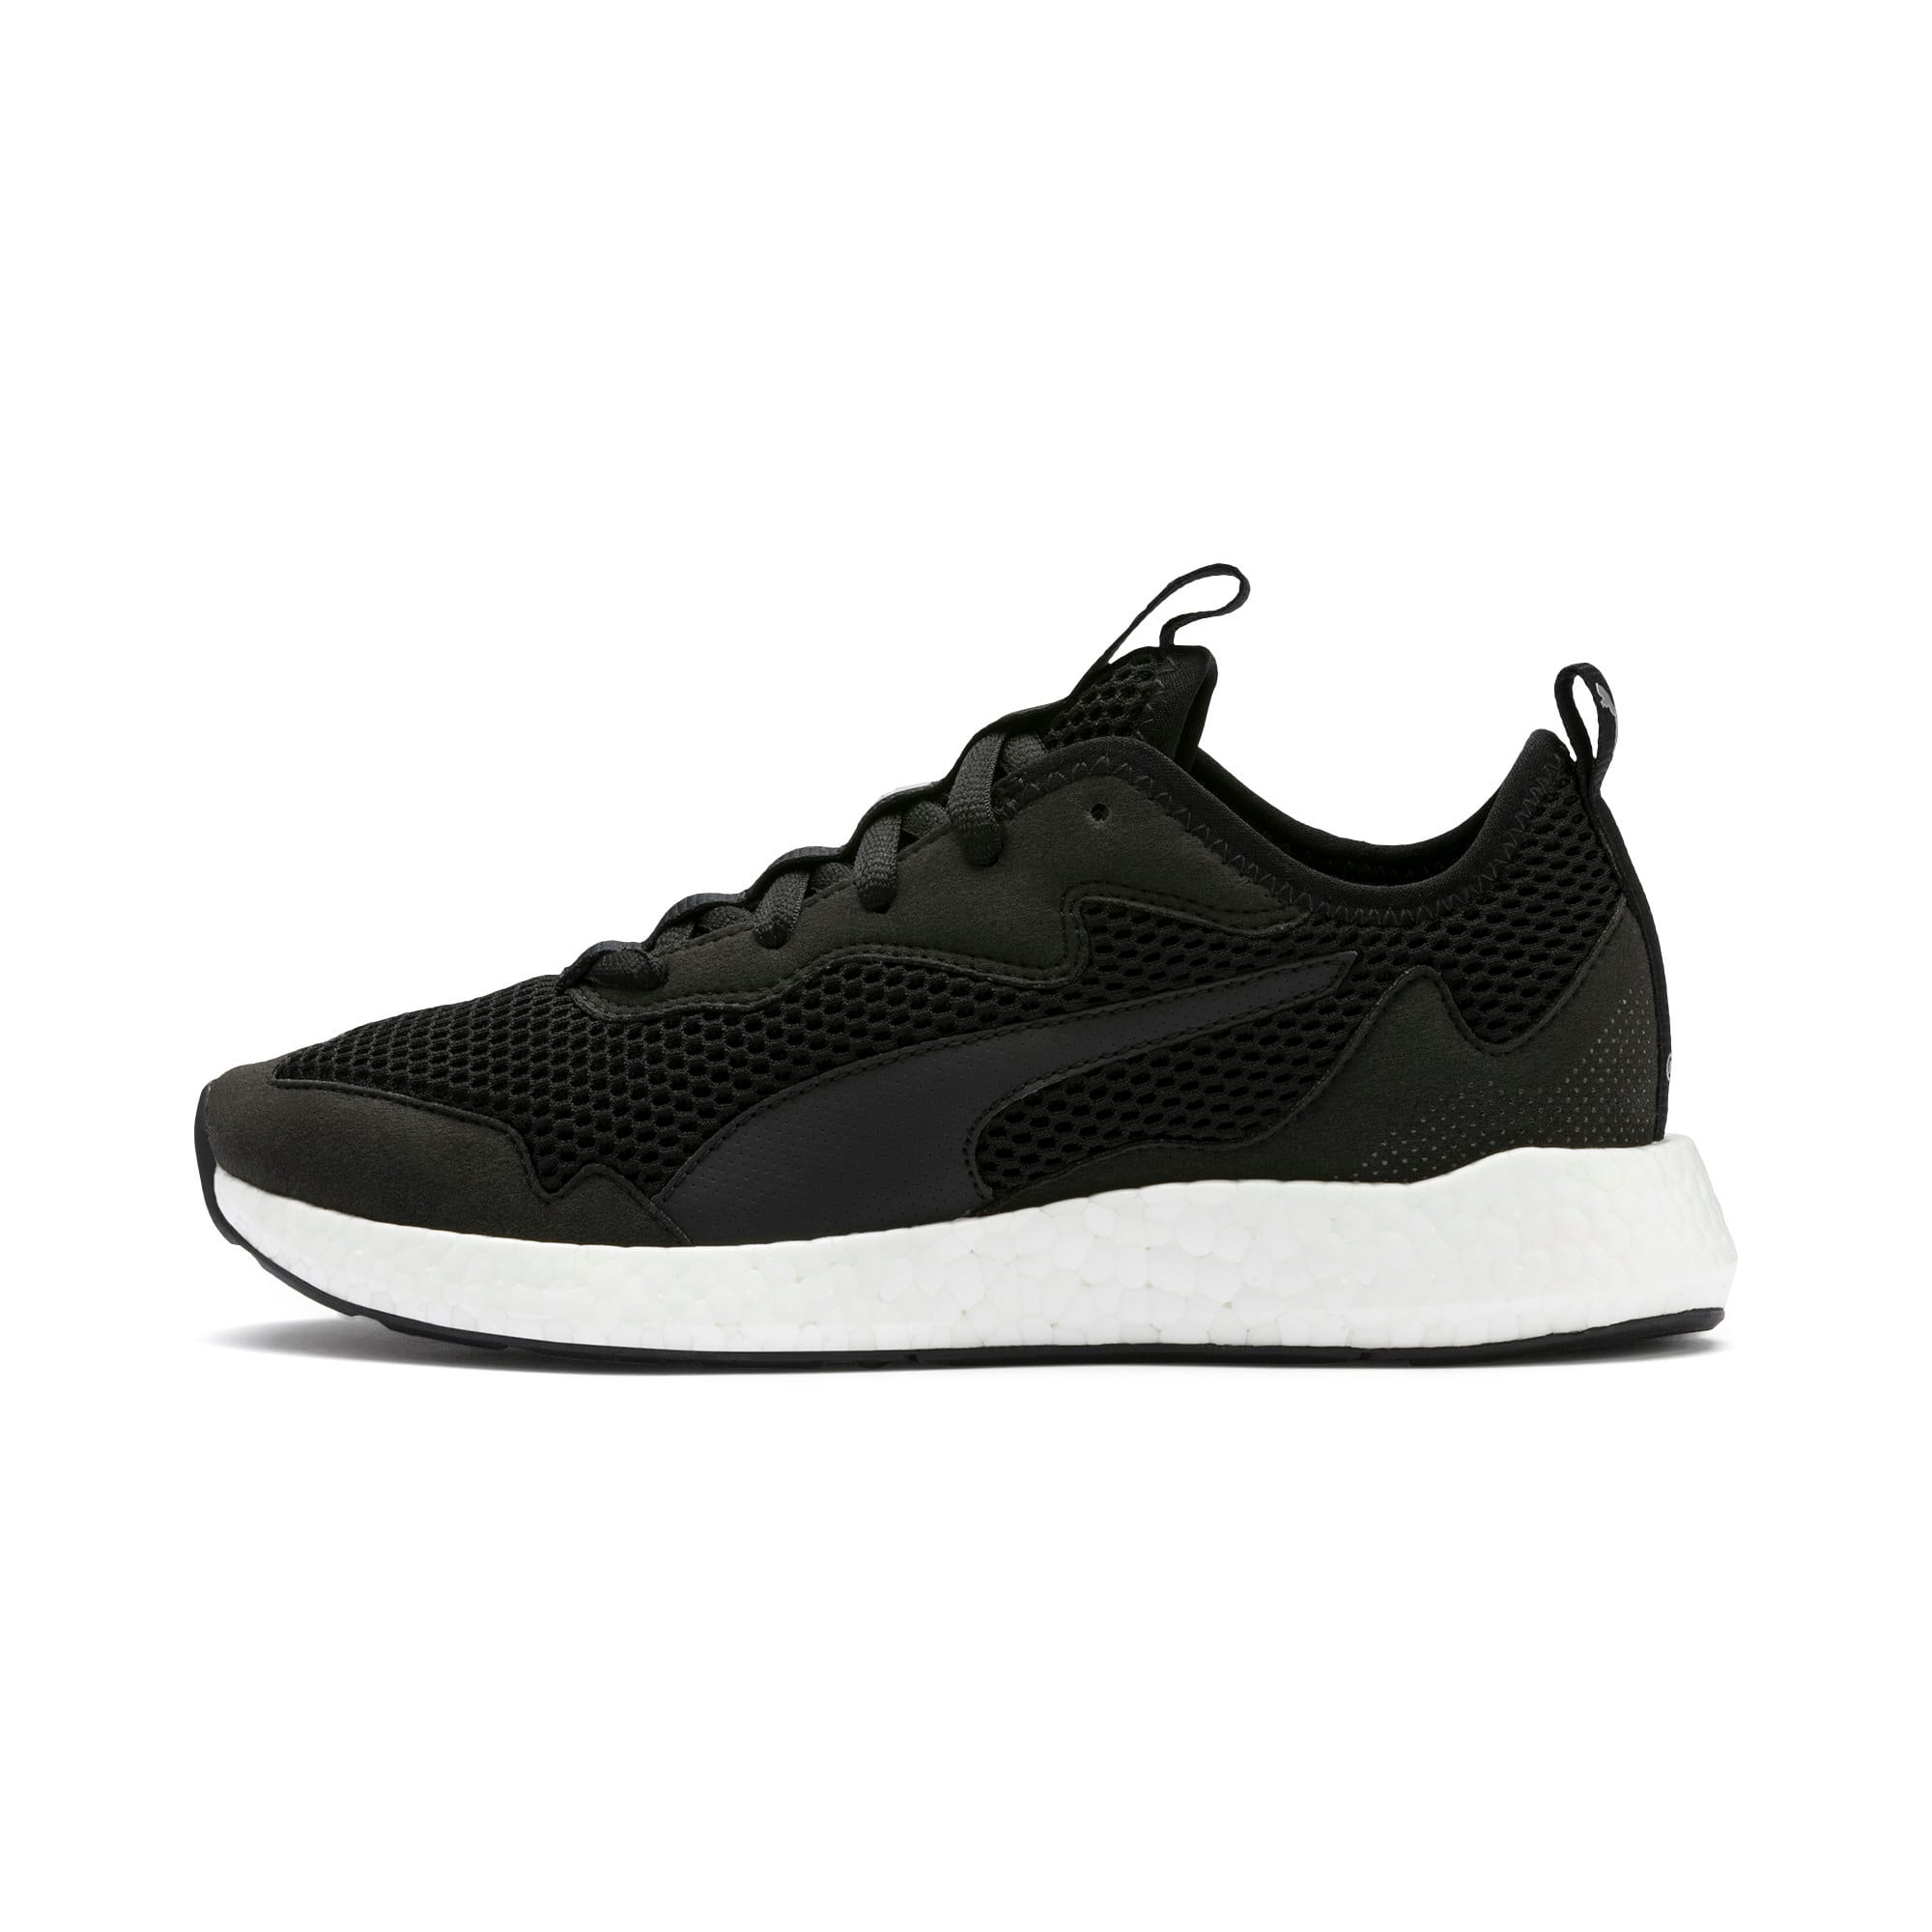 Thumbnail 1 of NRGY Neko Skim Women's Running Shoes, Puma Black-Puma Silver, medium